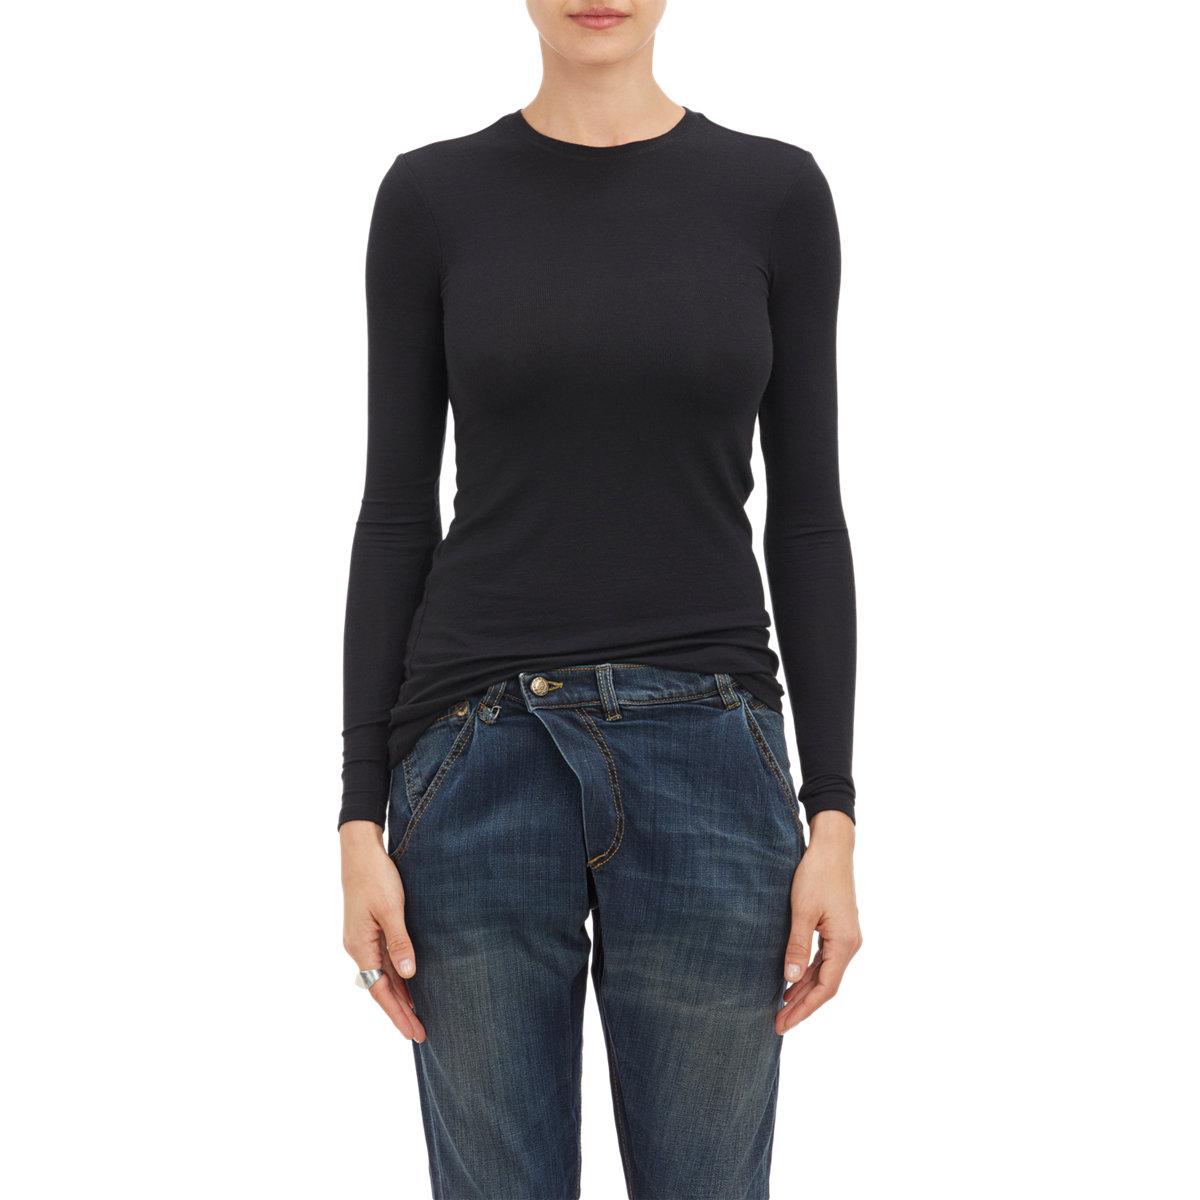 Atm rib knit long sleeve t shirt in black lyst for Ribbed long sleeve shirt